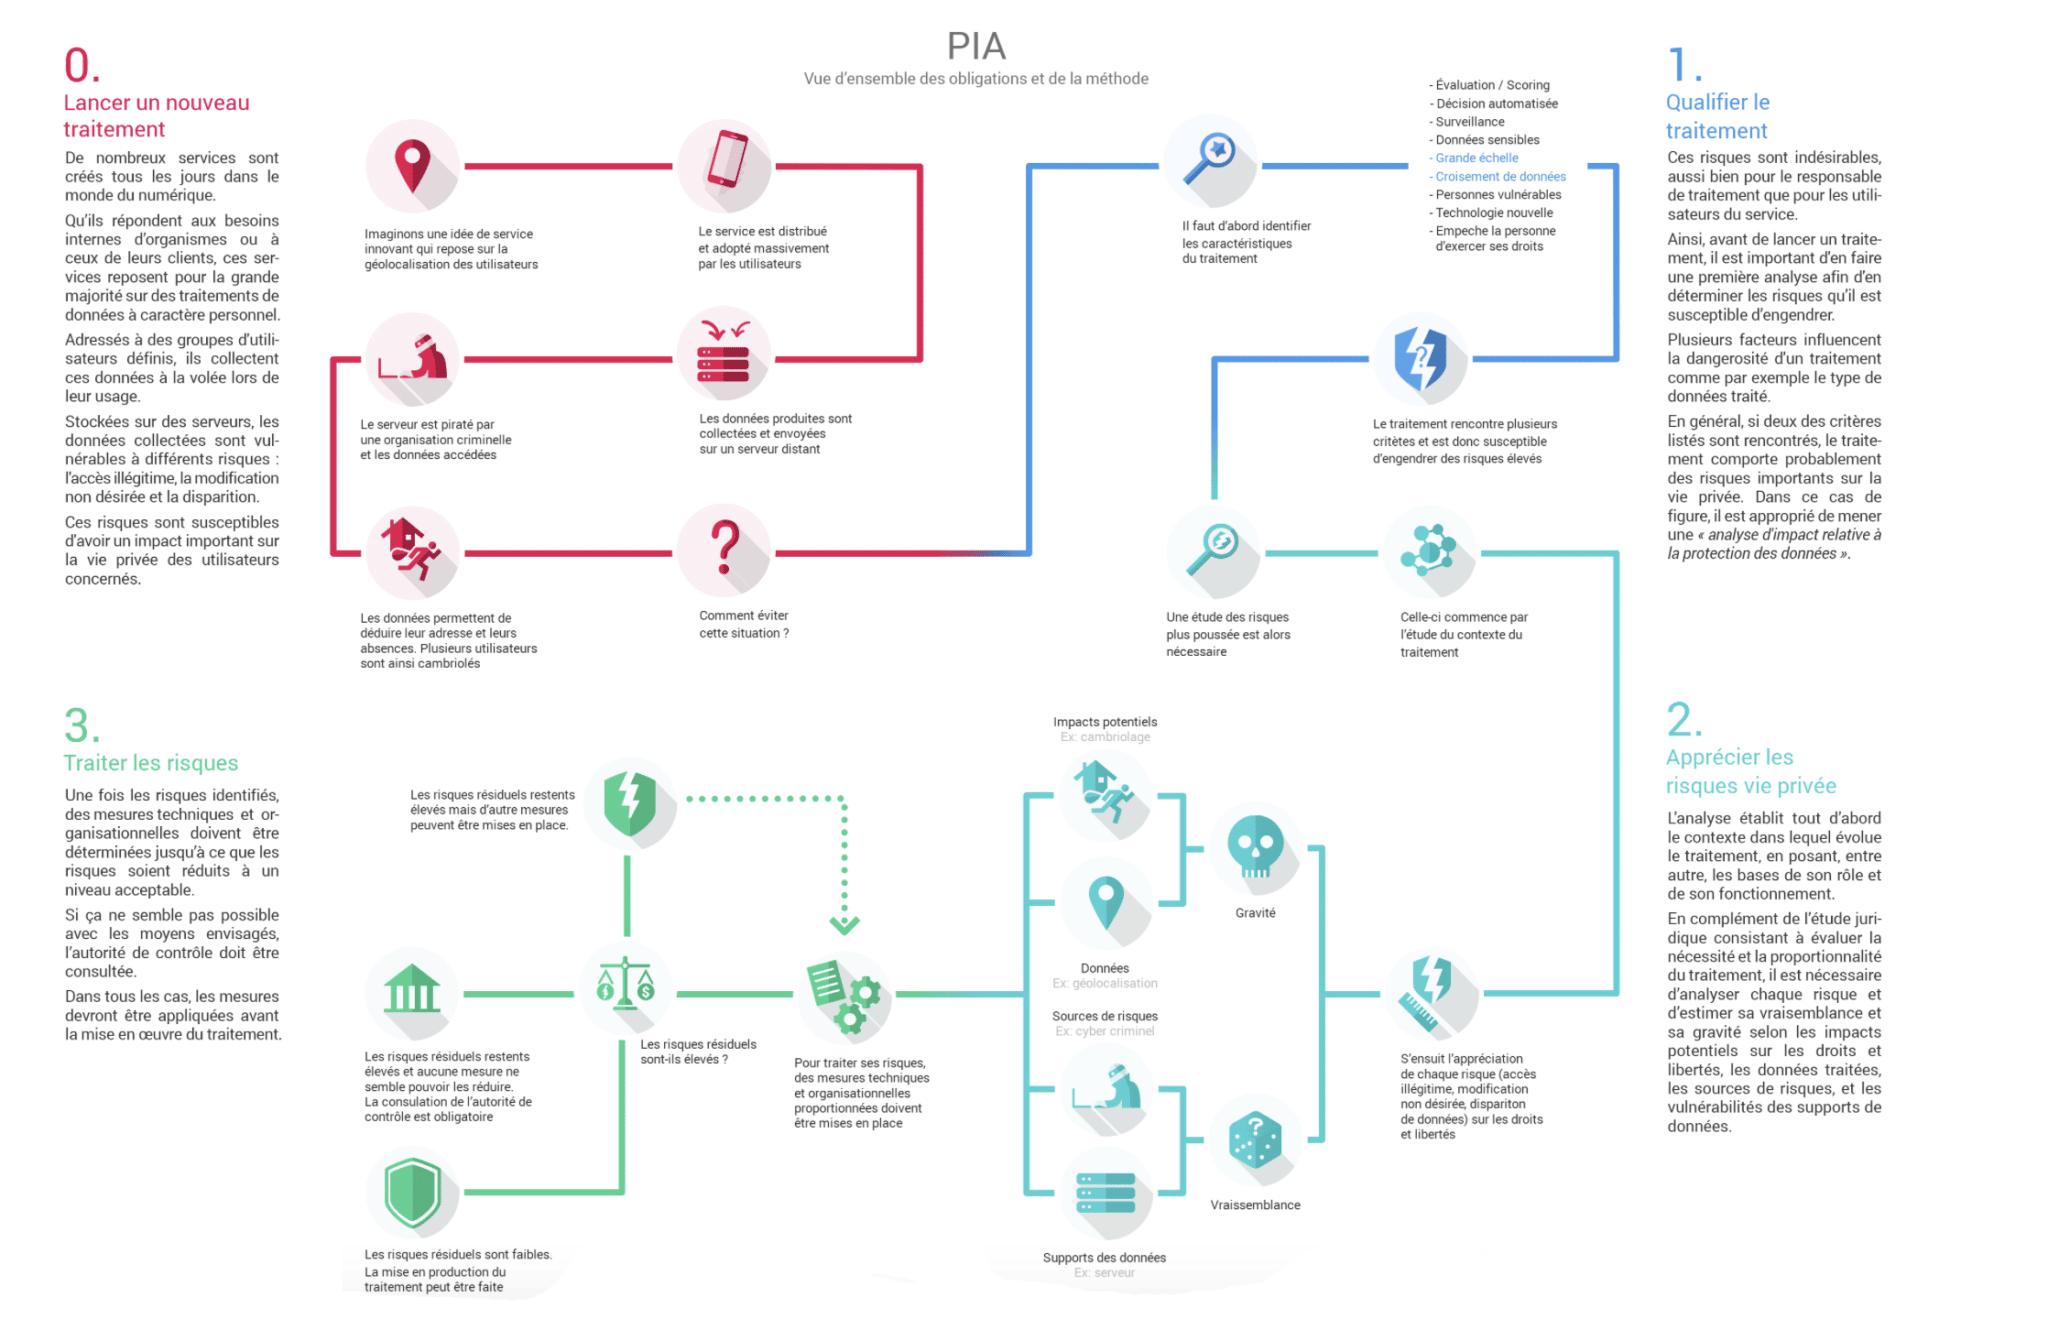 Visuel de la CNIL sur le PIA